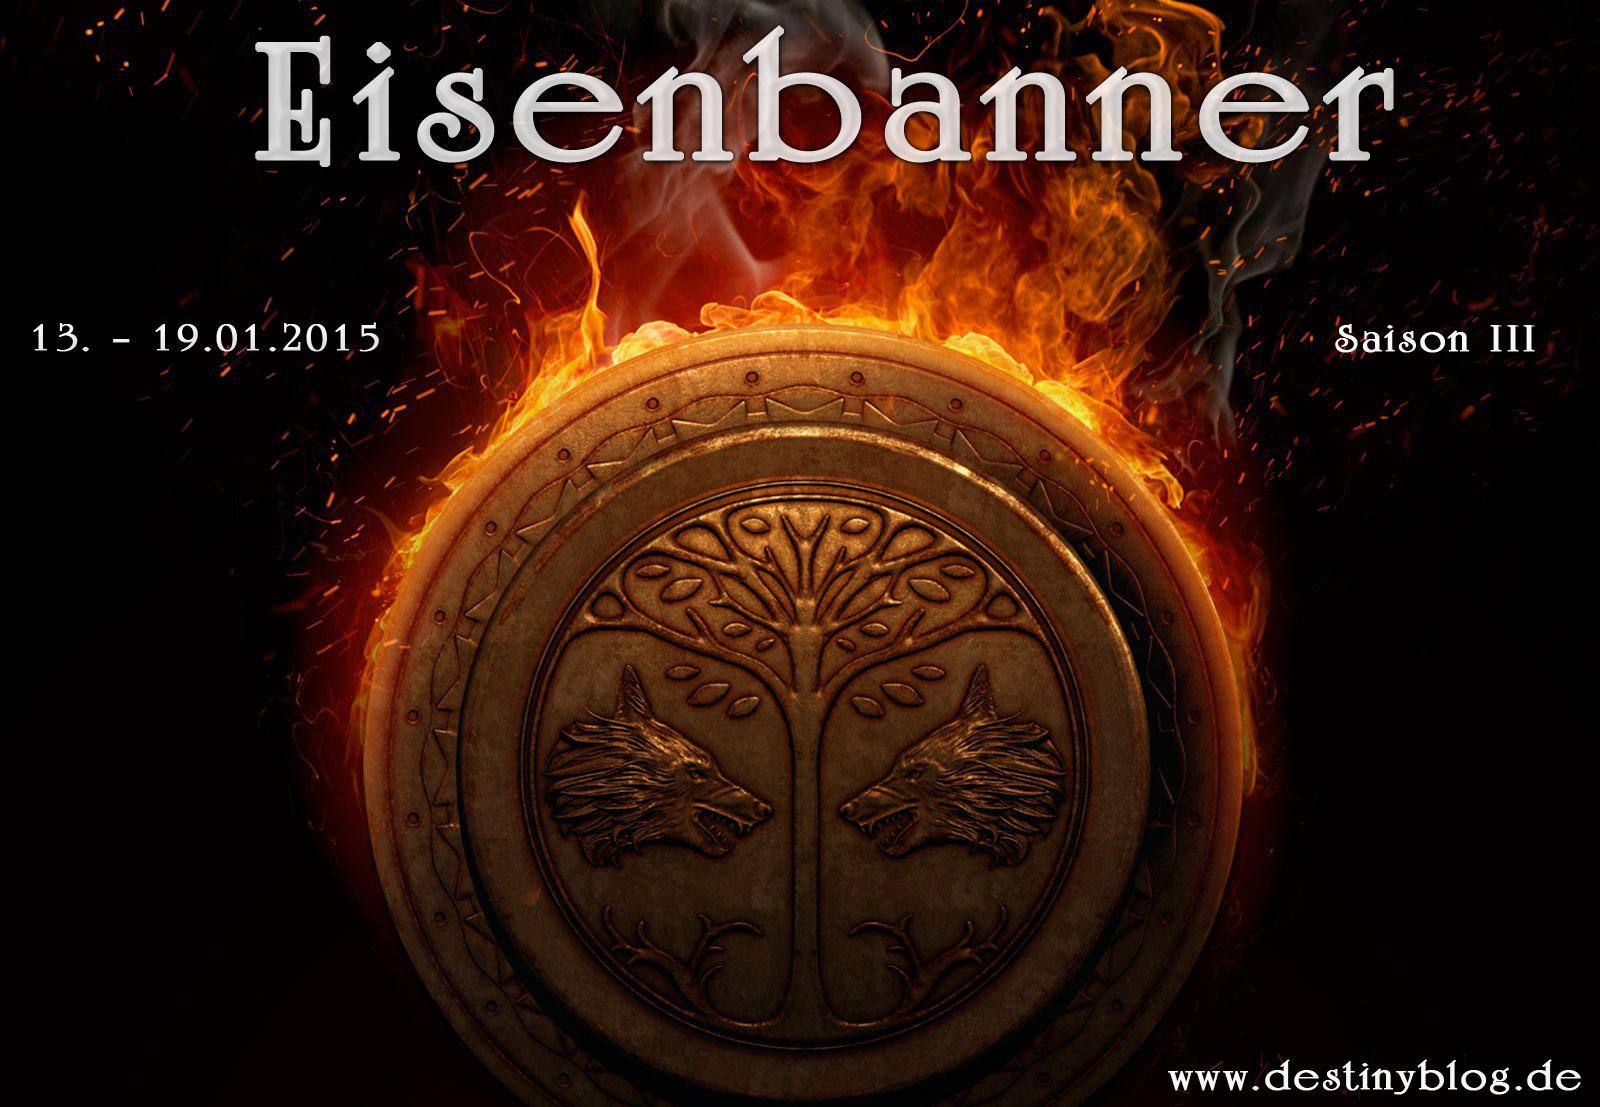 Destiny_Eisenbanner-pc-games